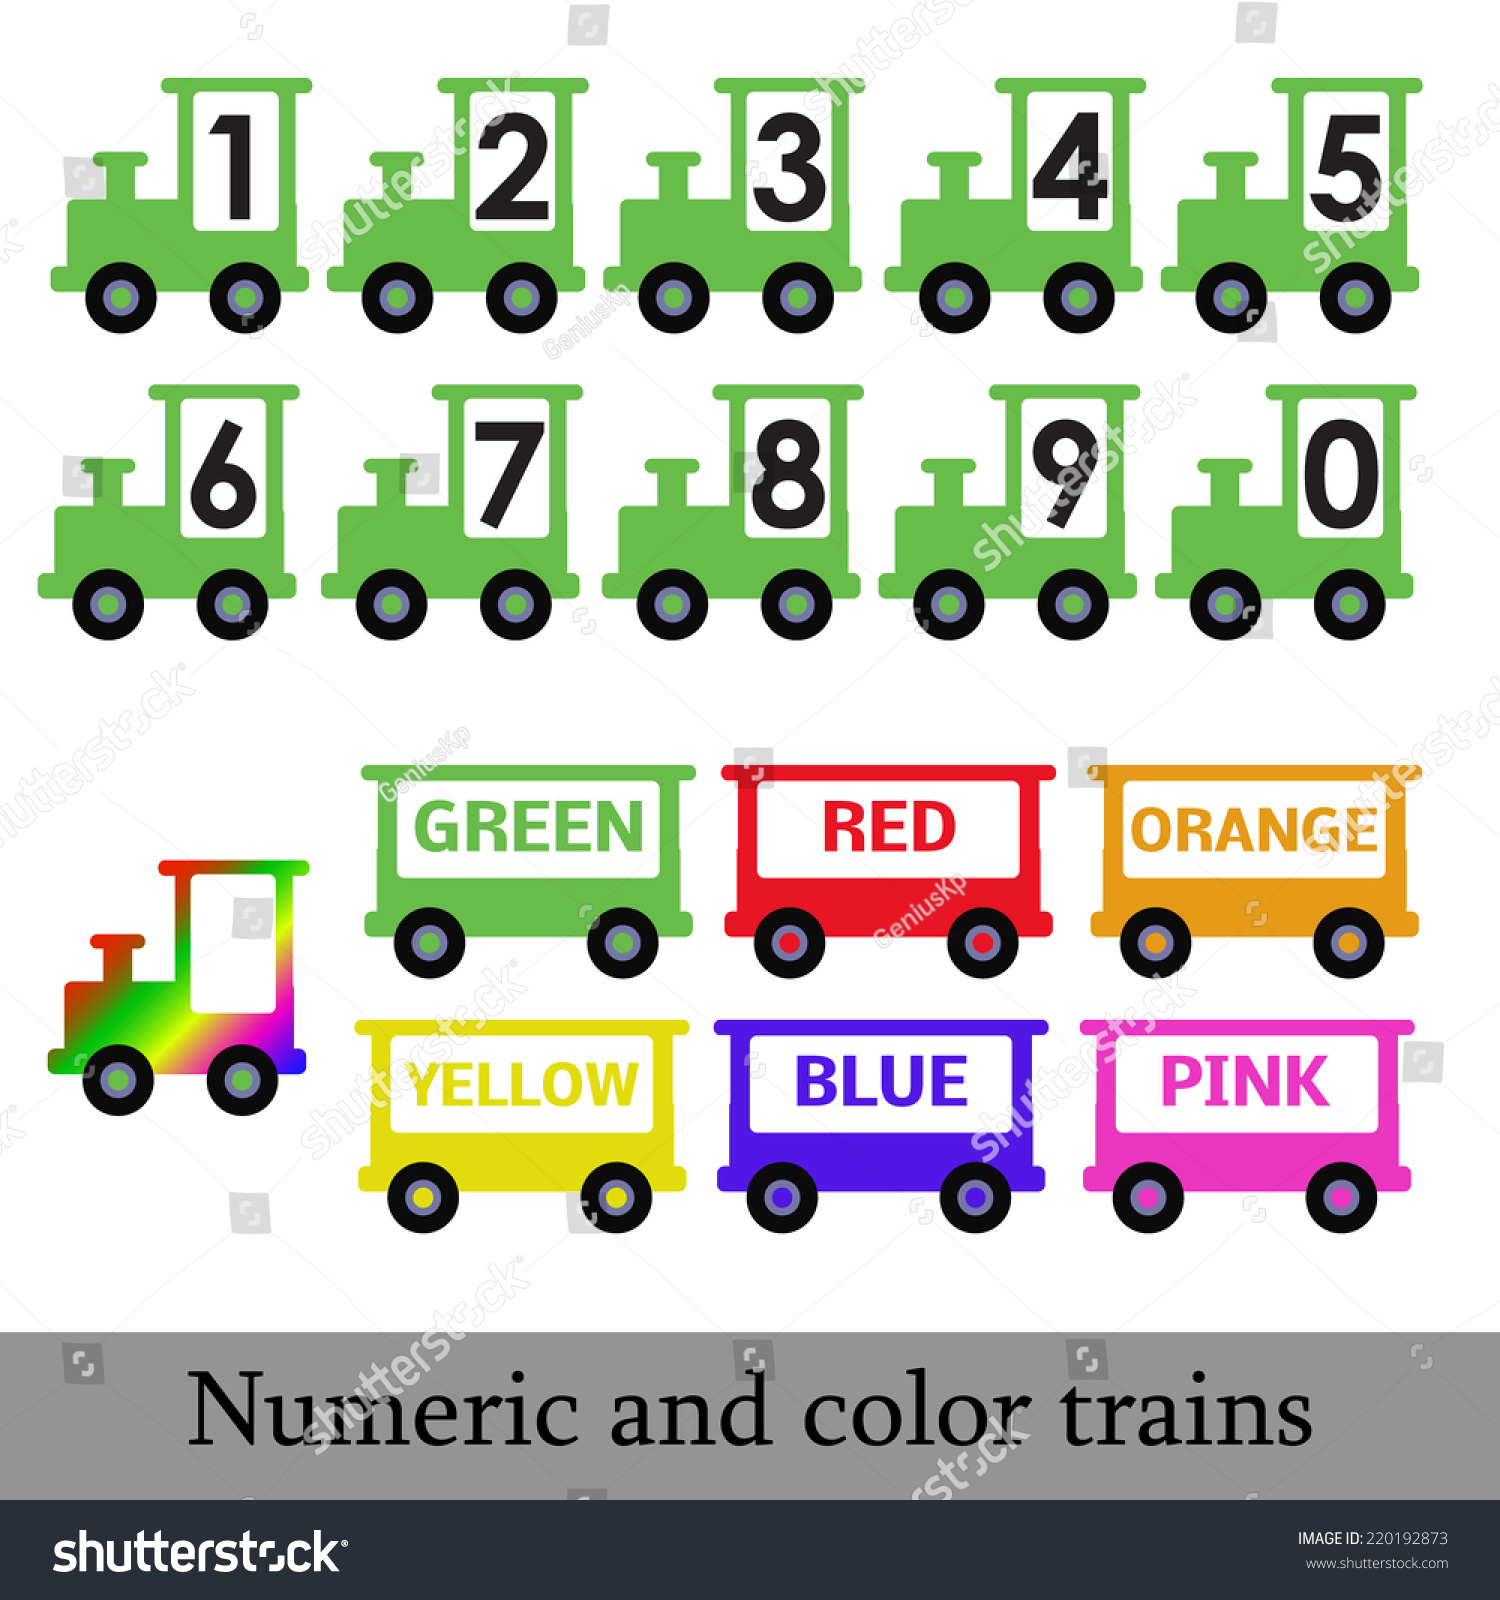 Colored Vector Trains Numbers Color Preschool Stock Vector 220192873 ...